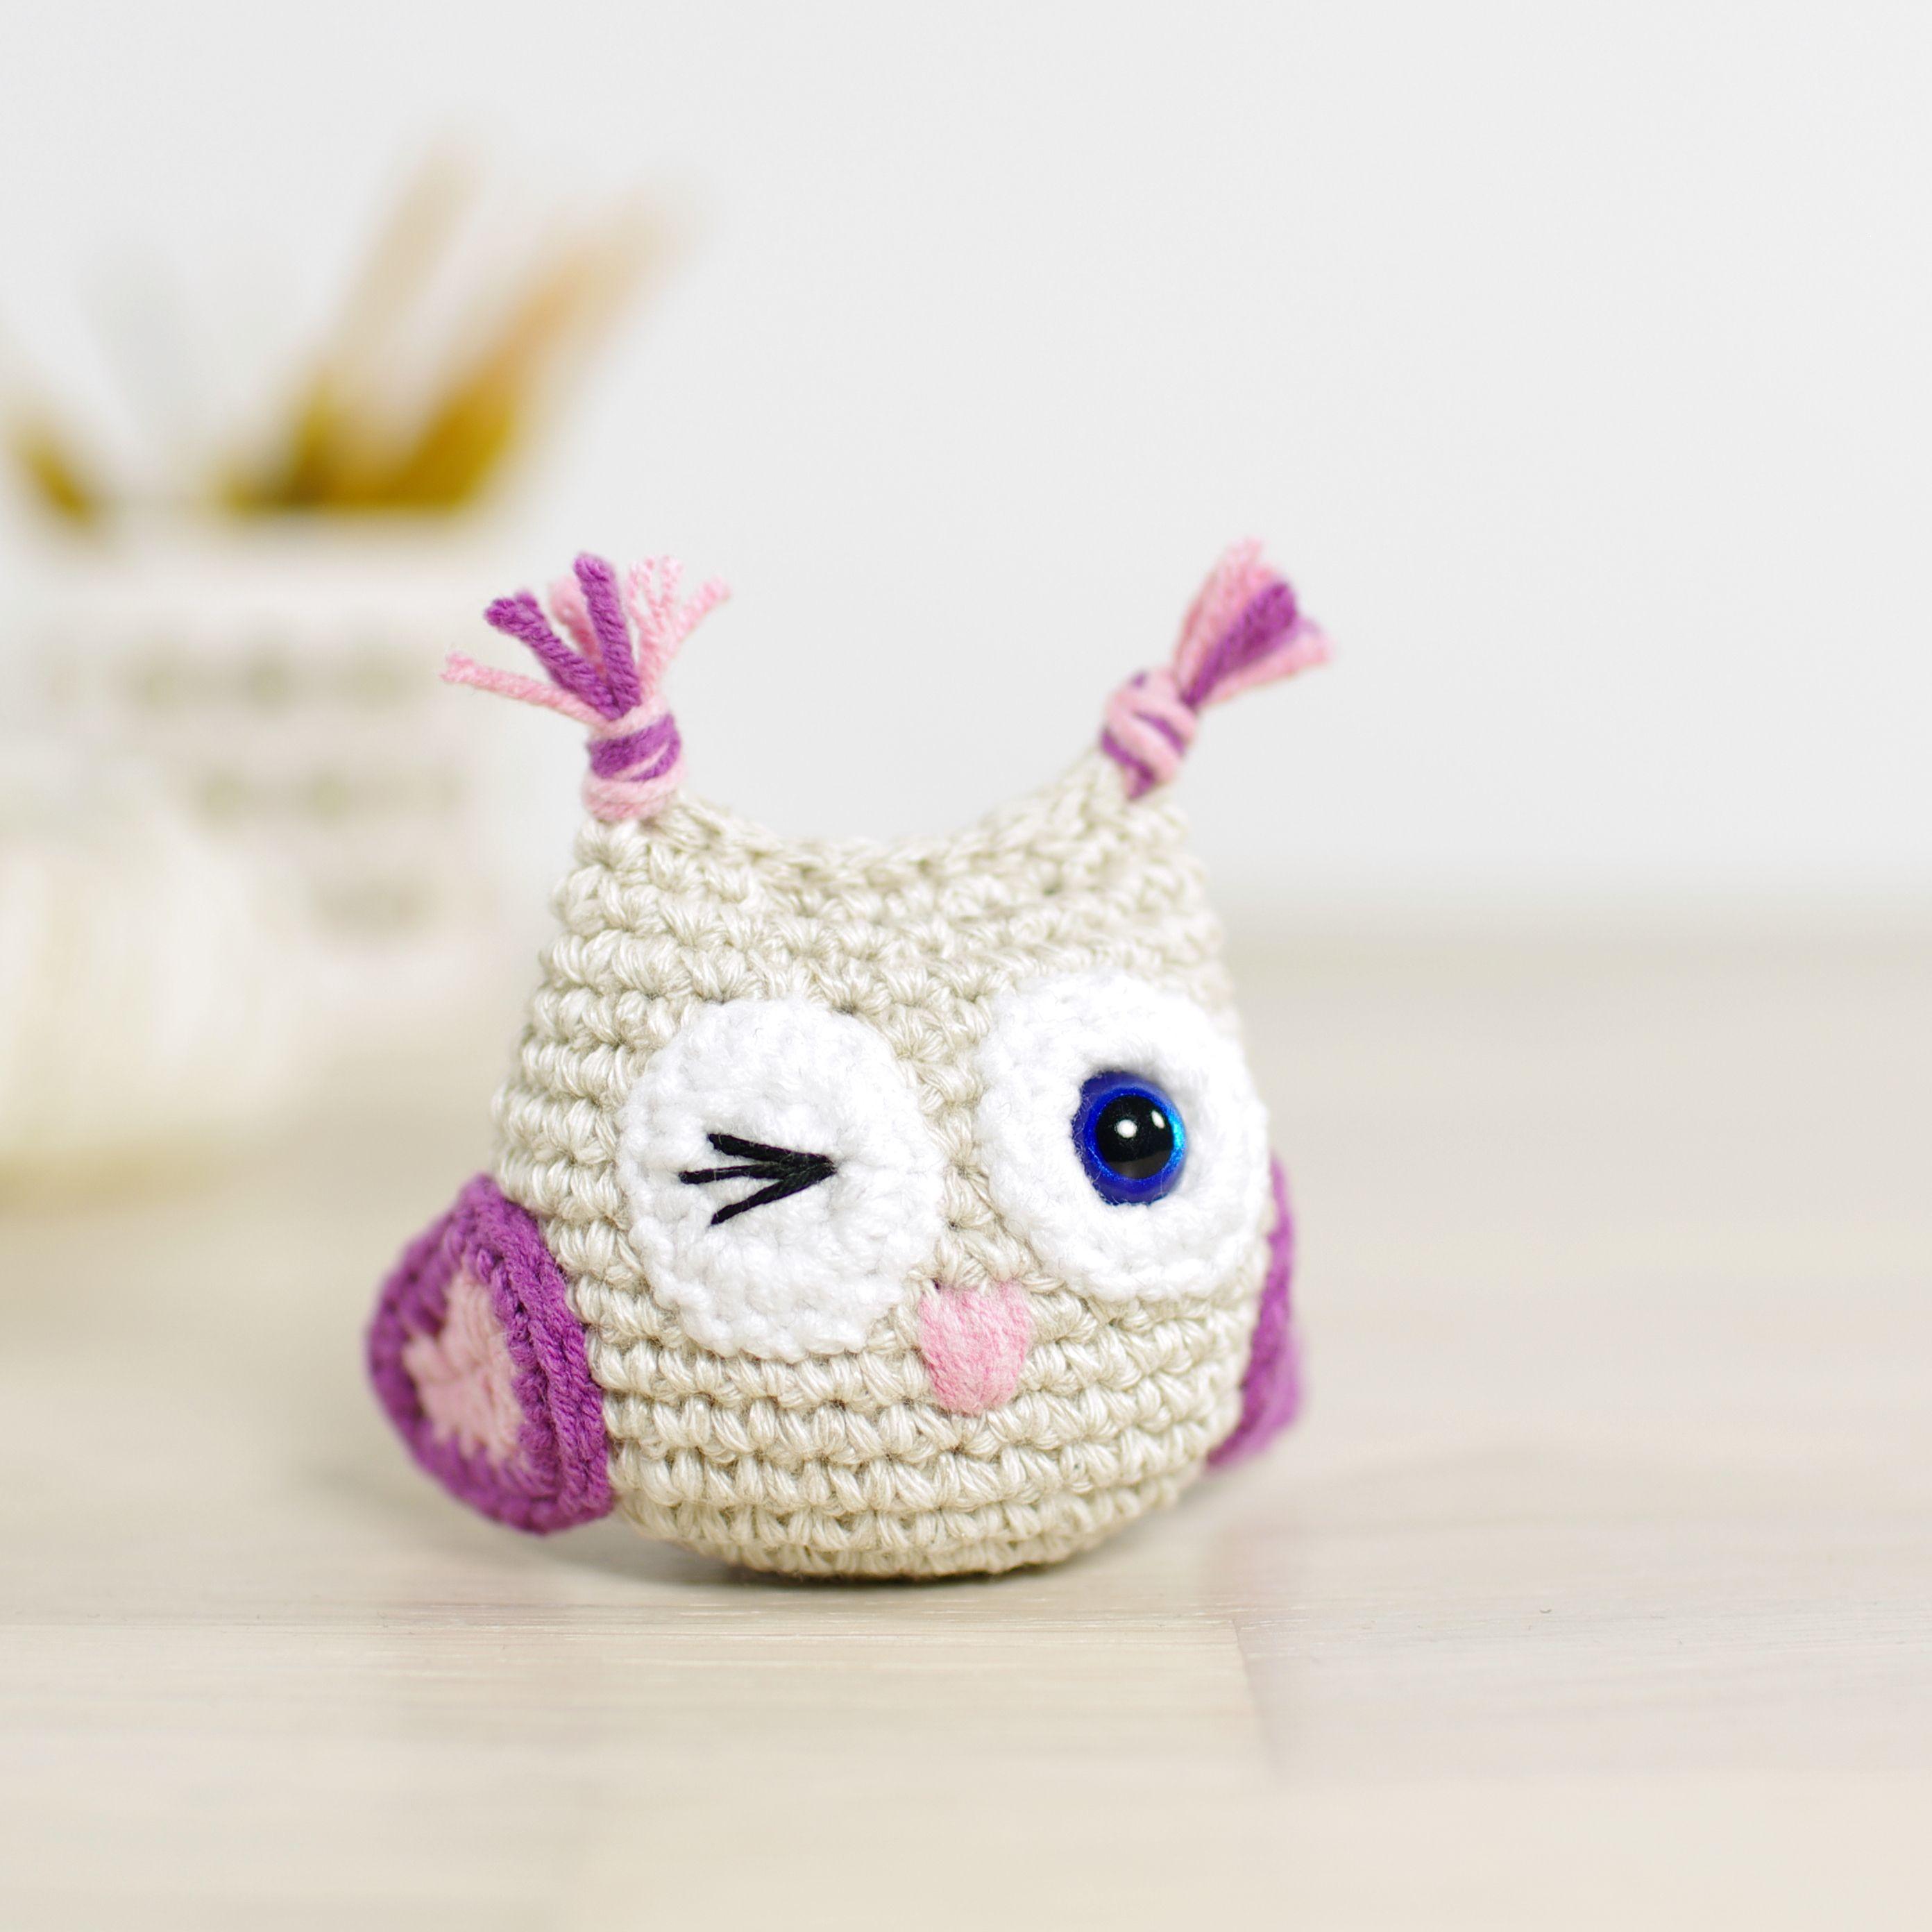 Free crochet pattern: Small amigurumi owl // Kristi Tullus (spire.ee ...